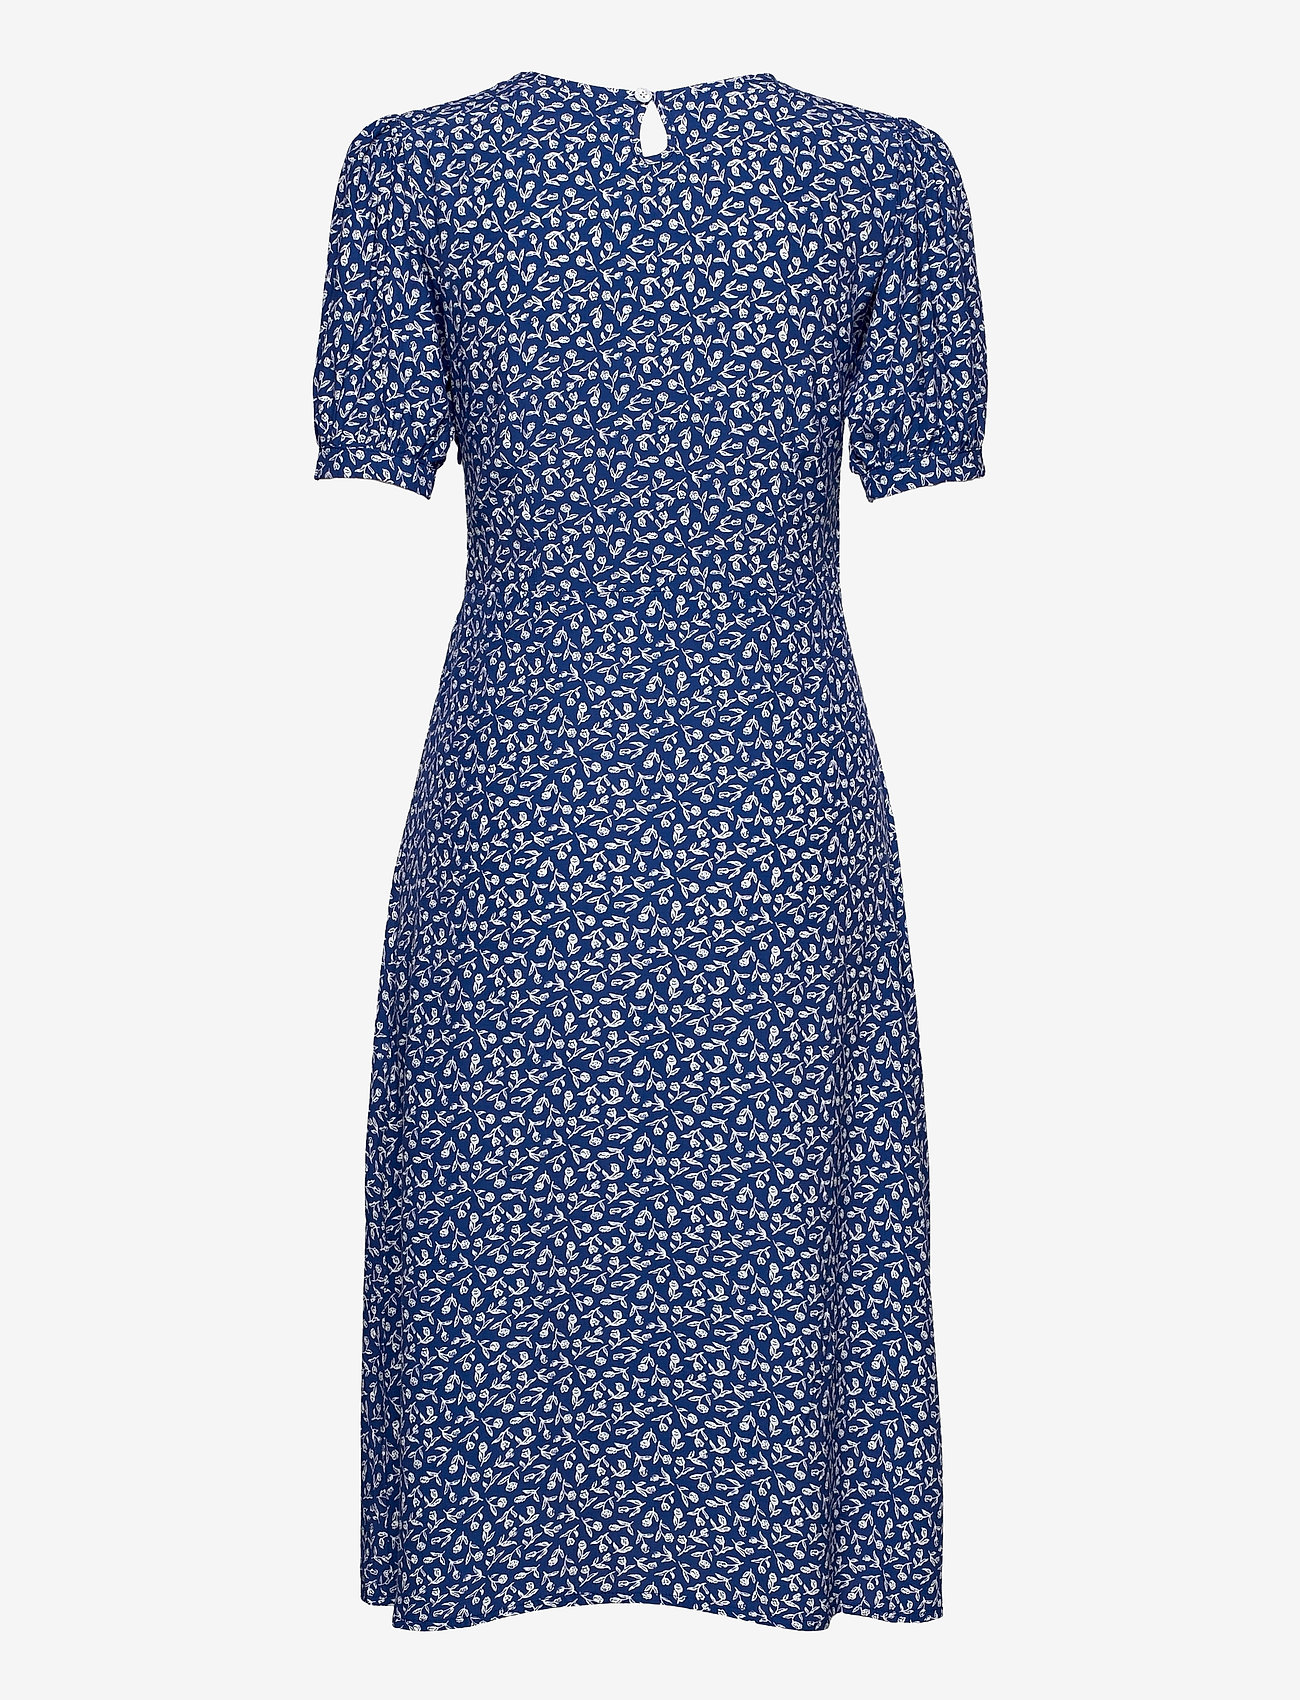 Faithfull The Brand - SAMIRAH MIDI DRESS - zomerjurken - maddy floral print - vintage blue - 1